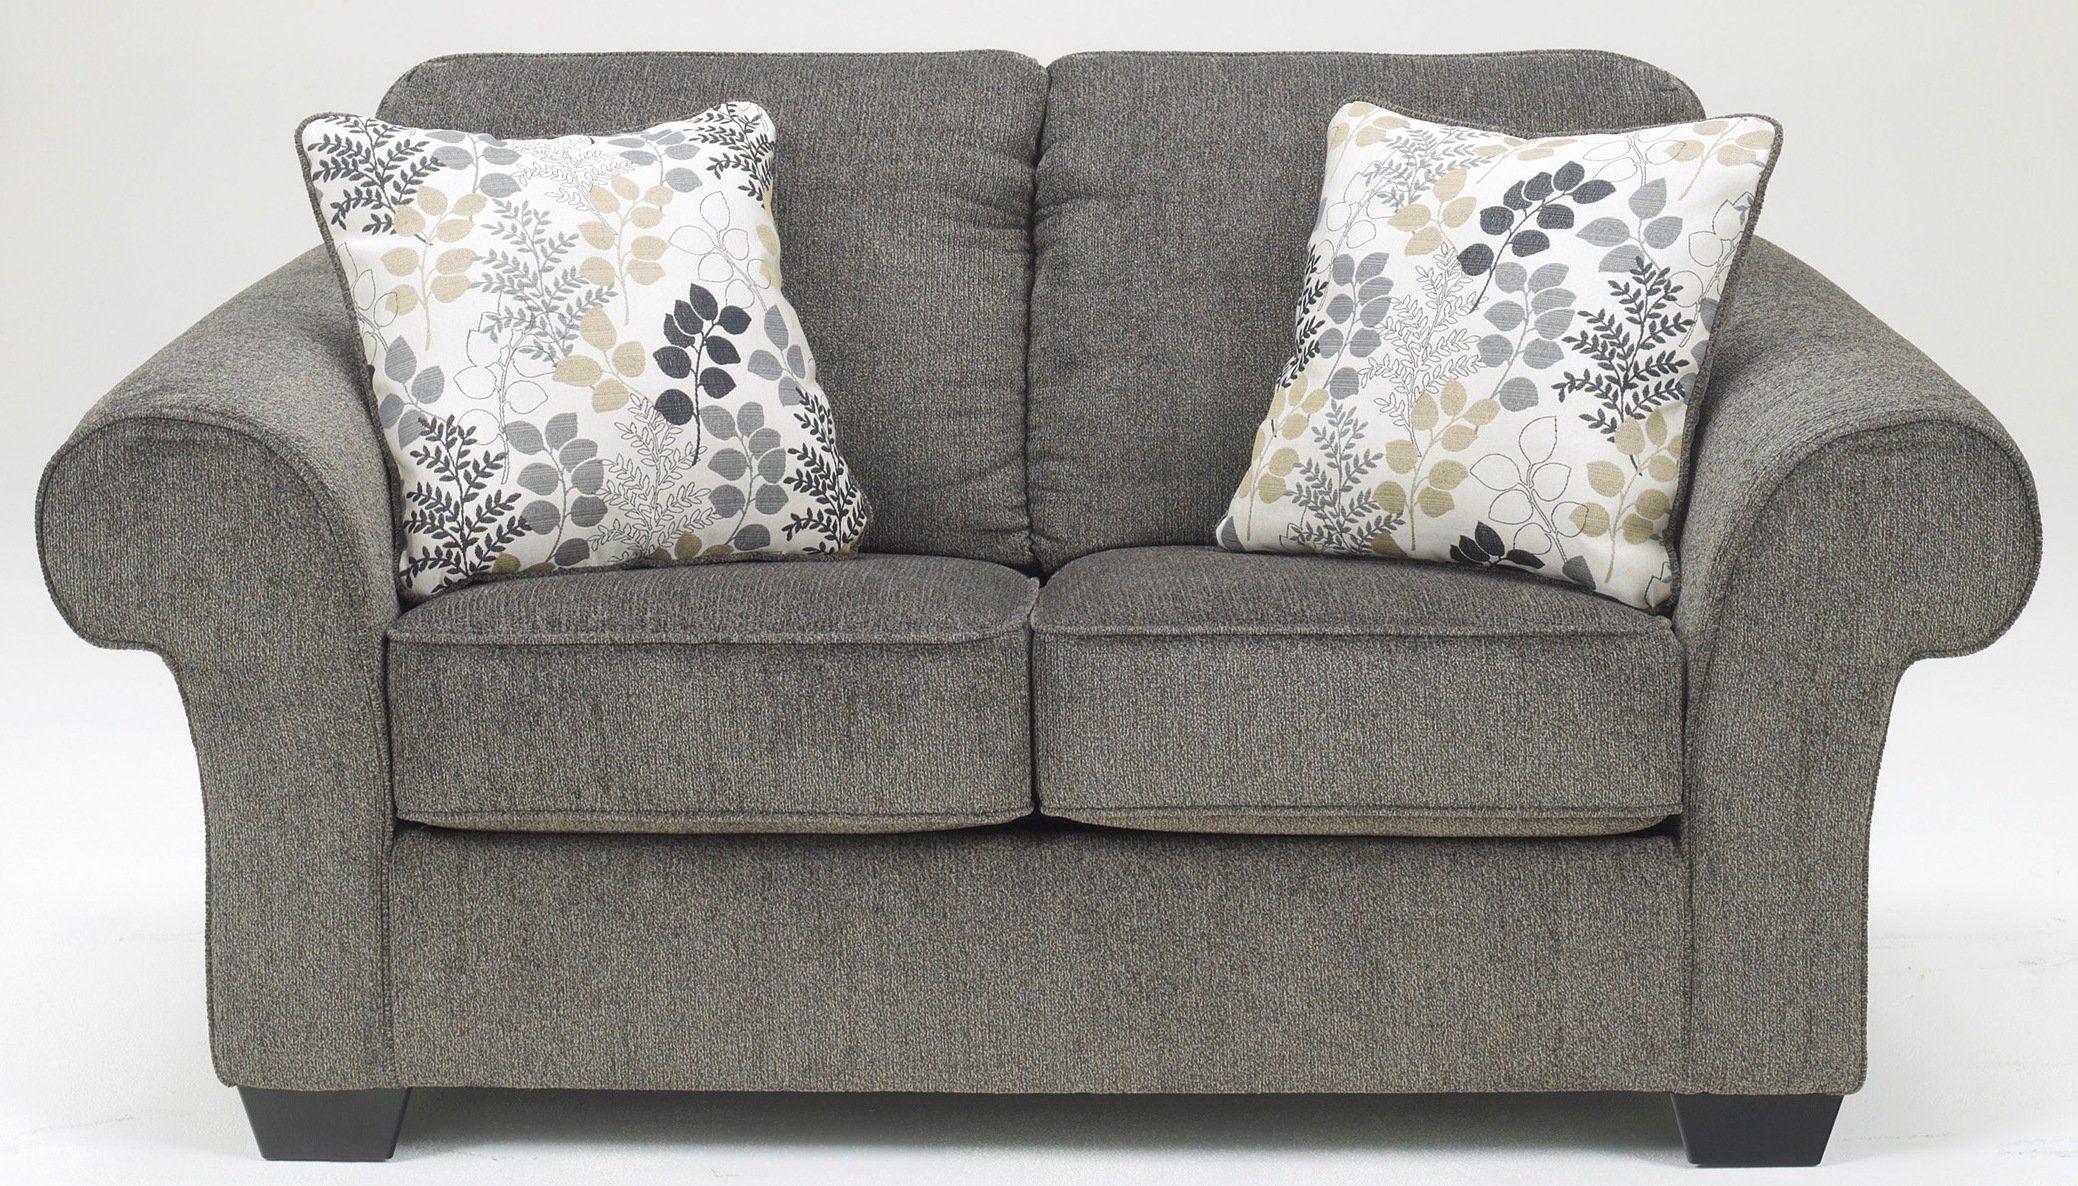 Ashley Furniture Signature Design Makonnen Loveseat Contemporary High Nap Chenille Sofa Charcoal Be Sure To C Love Seat Charcoal Loveseat Ashley Furniture